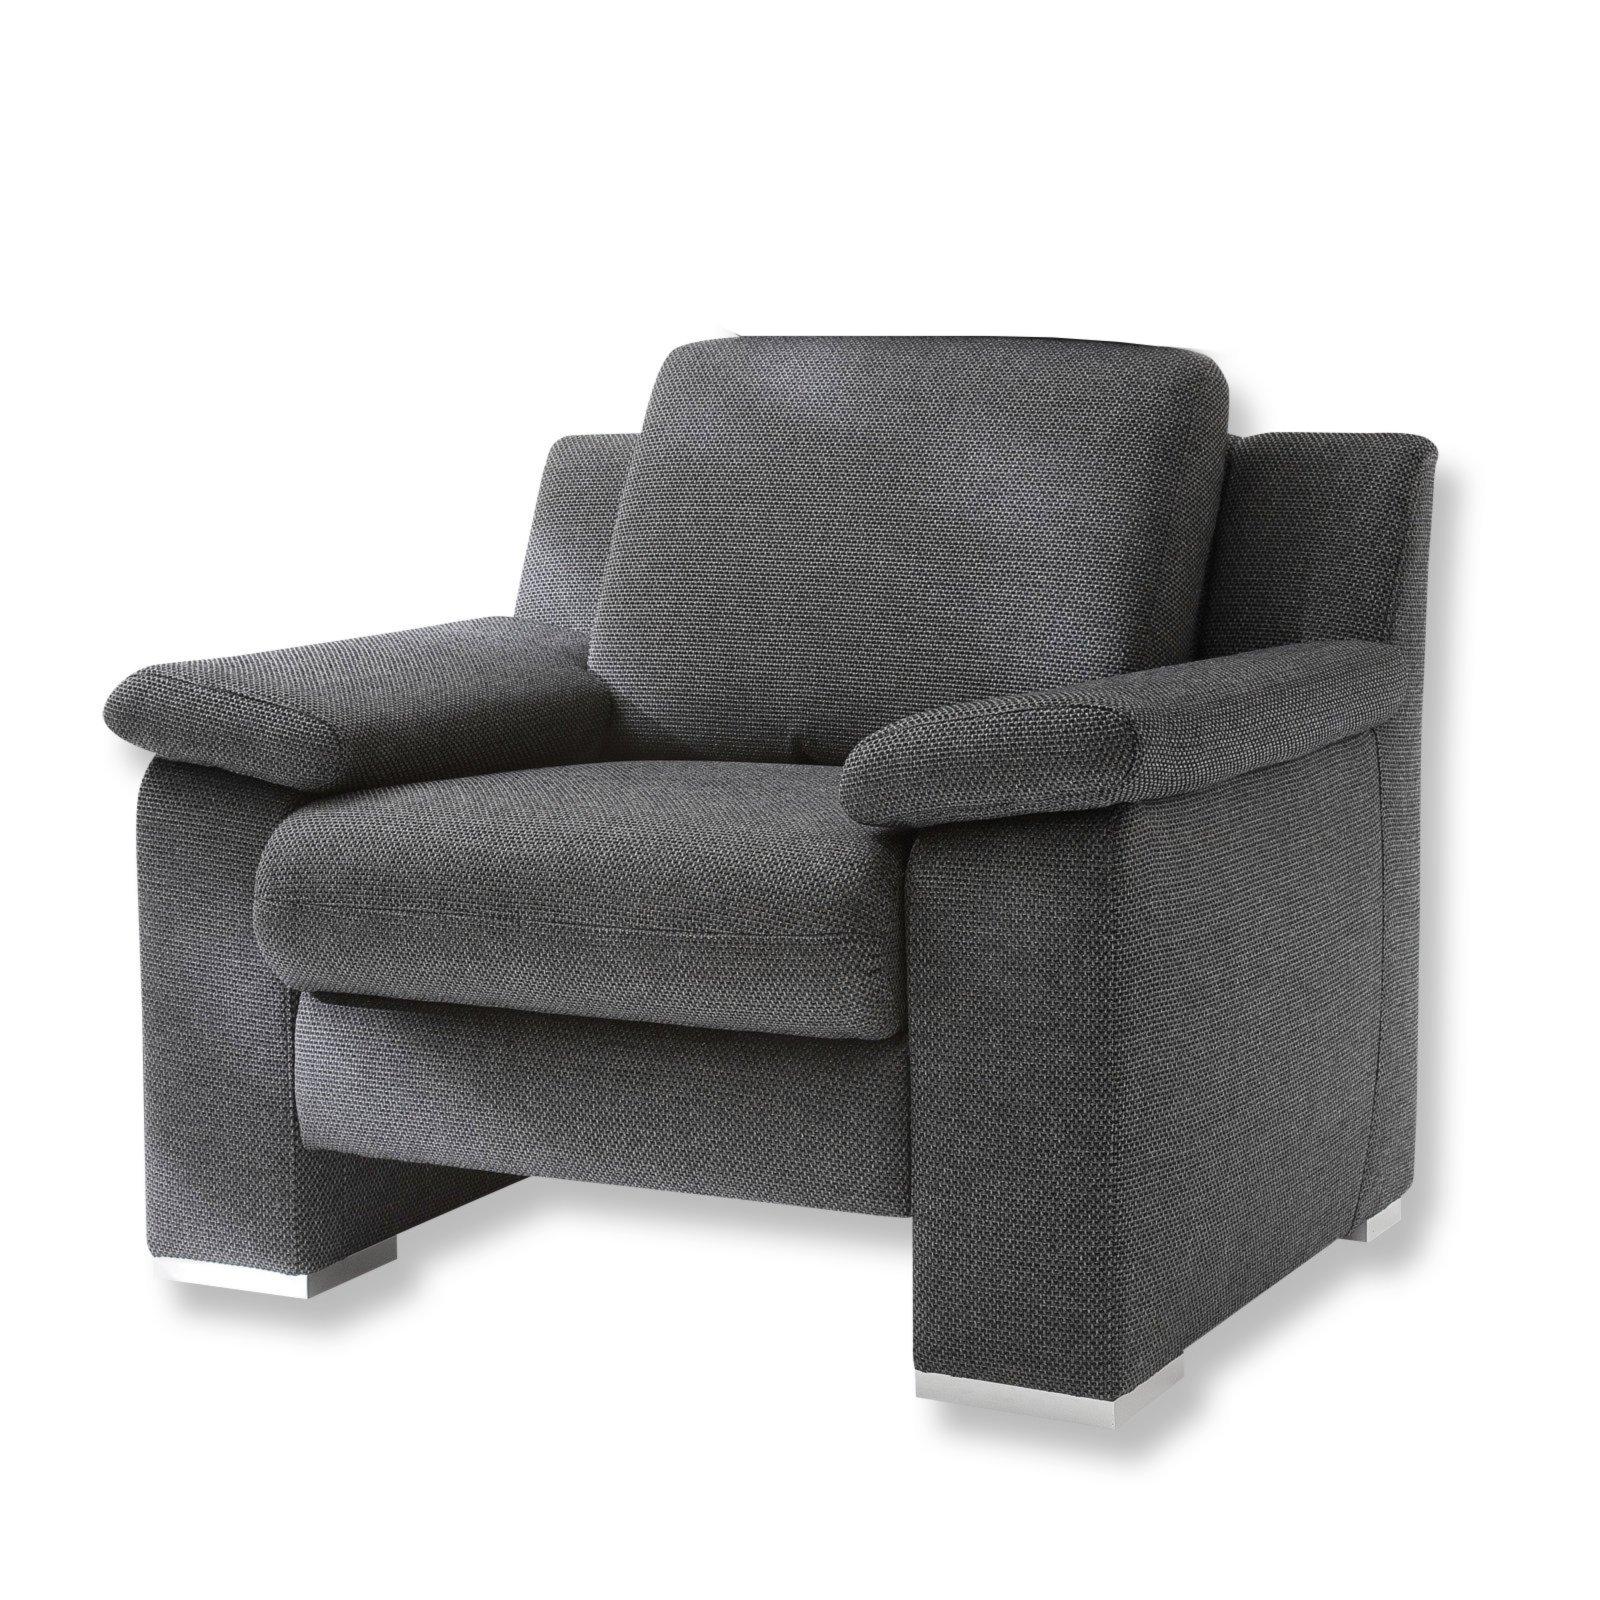 sessel grau mit metallf en fernseh relaxsessel sessel hocker m bel roller. Black Bedroom Furniture Sets. Home Design Ideas